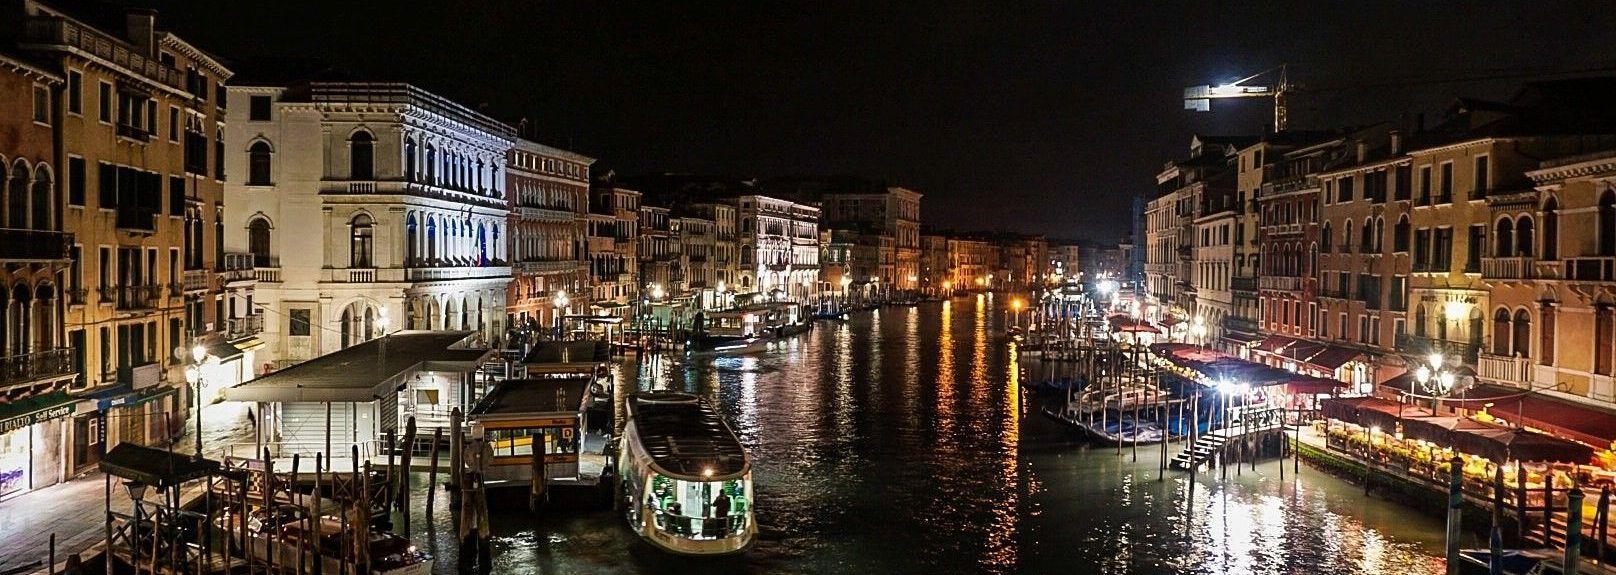 Mestre, Venedig, Veneto, Italien